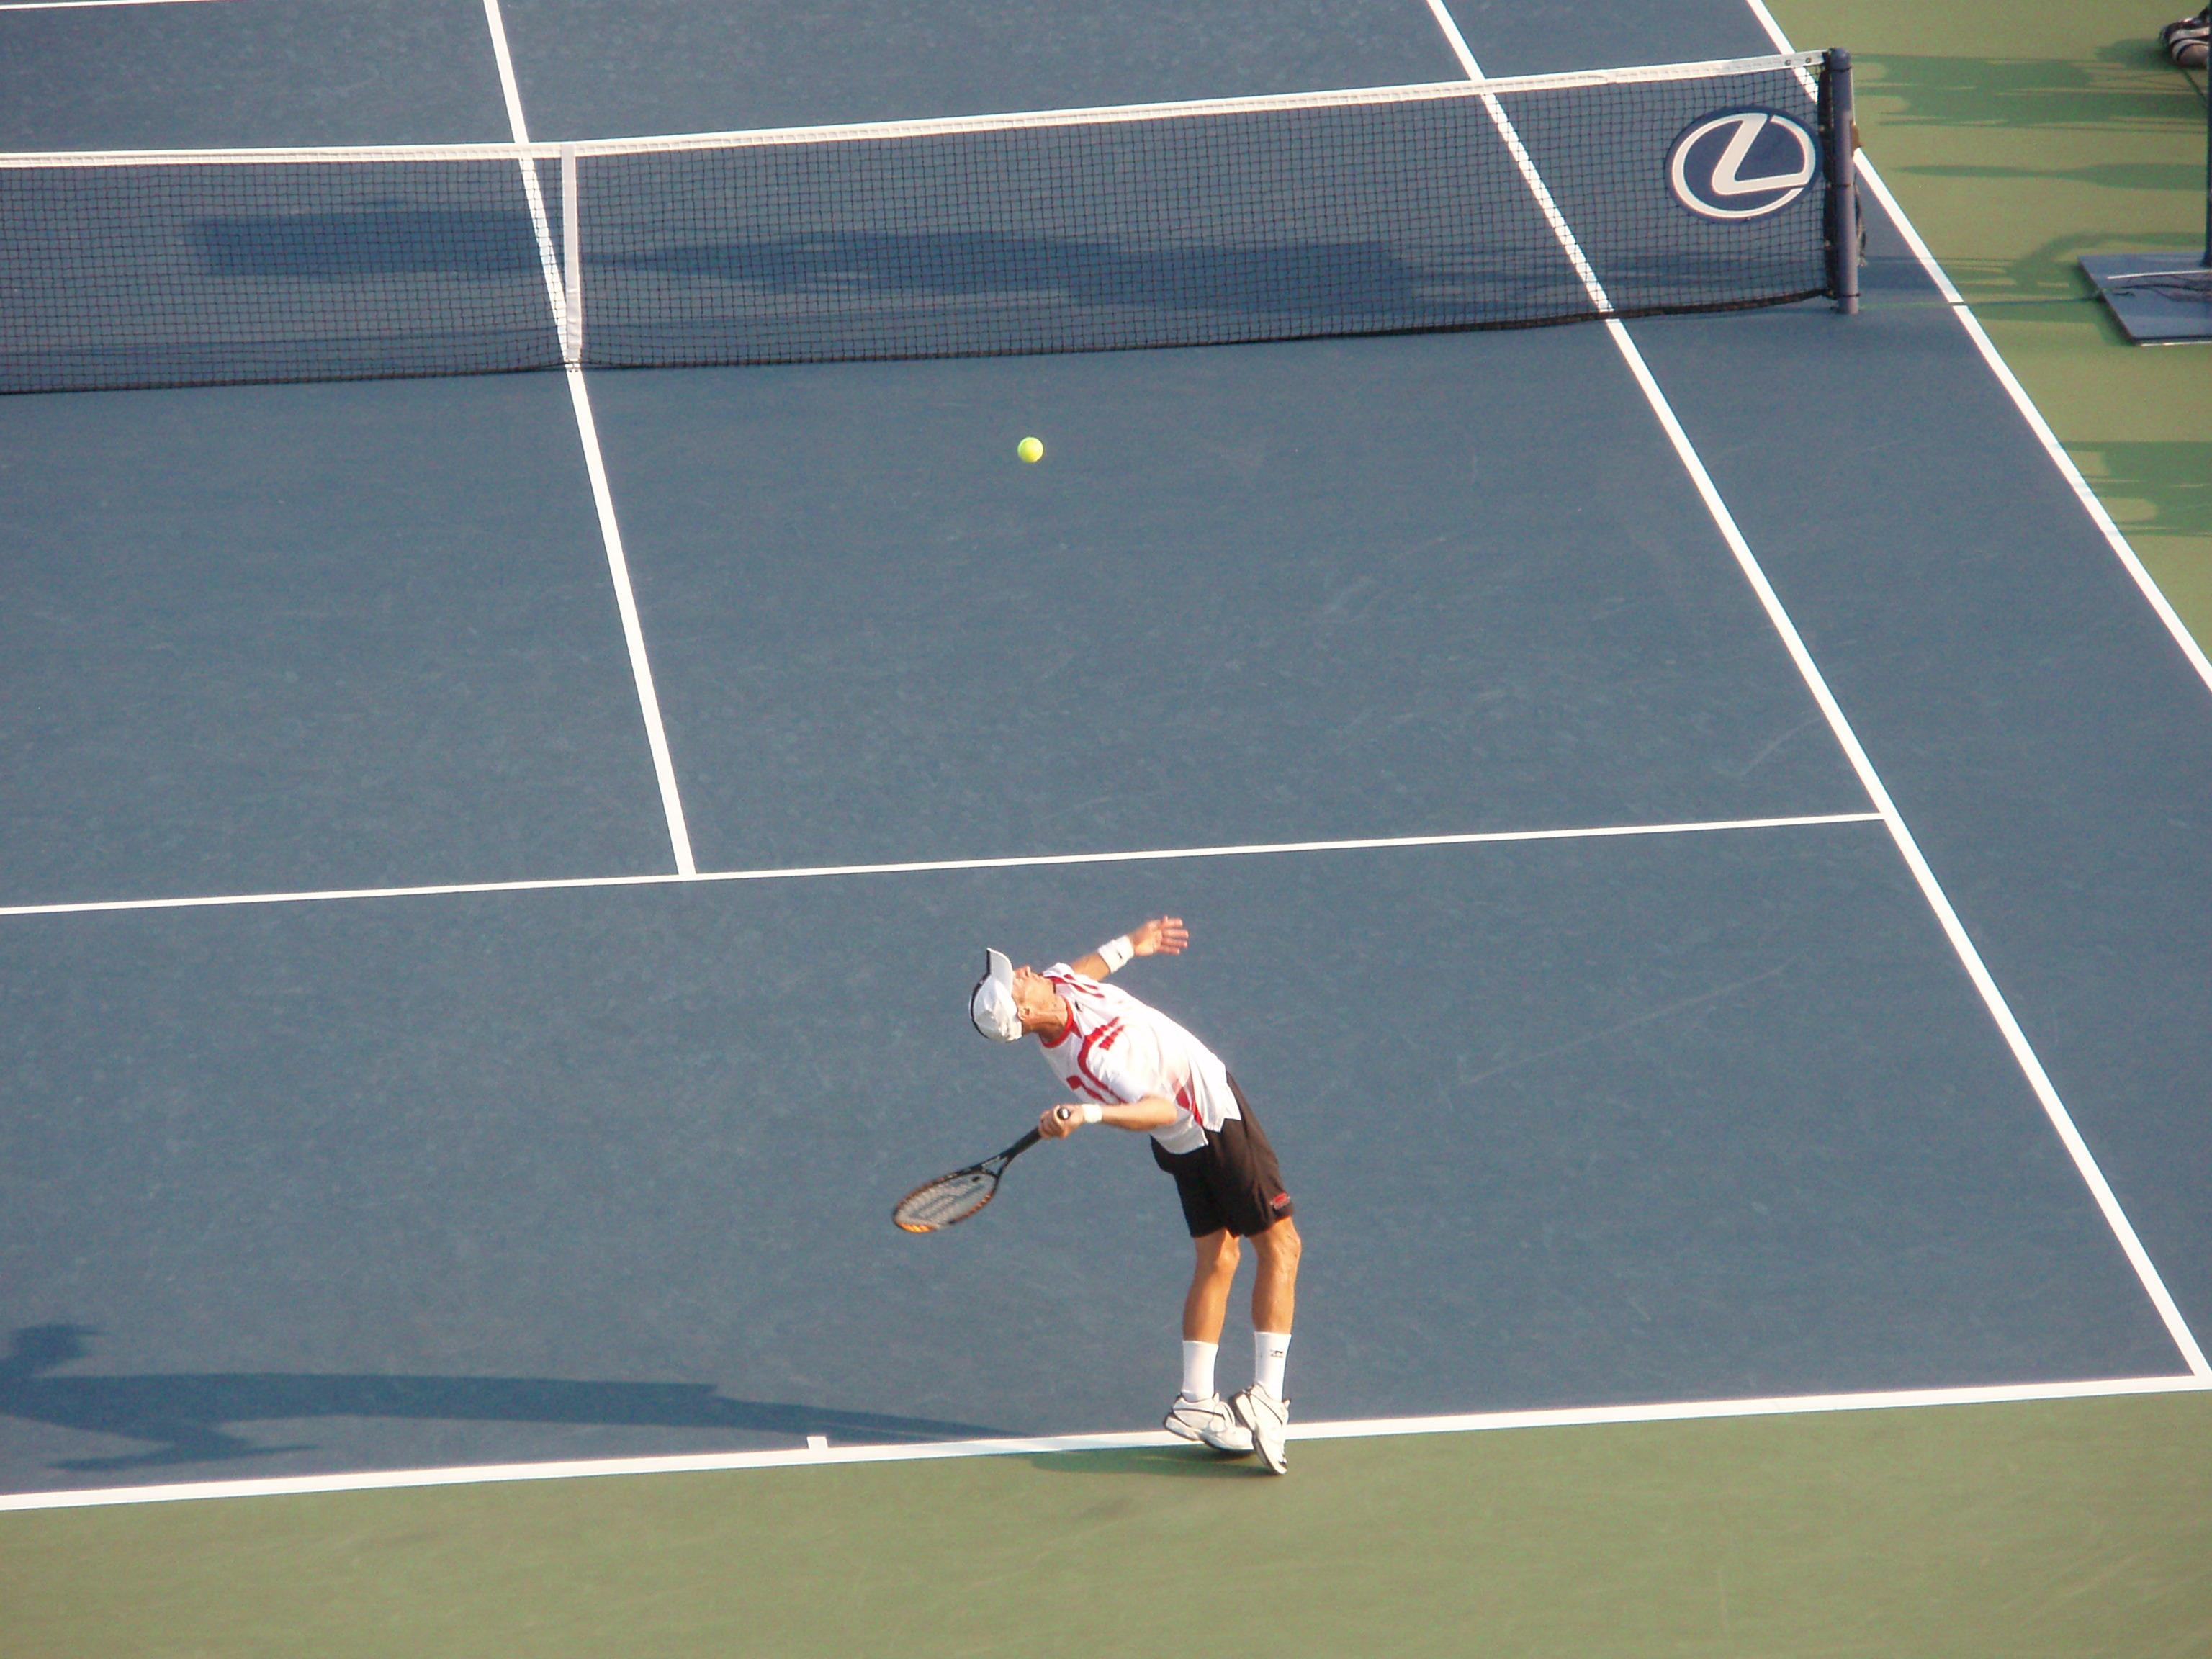 939a75a922c Pista de tenis dura - Wikipedia